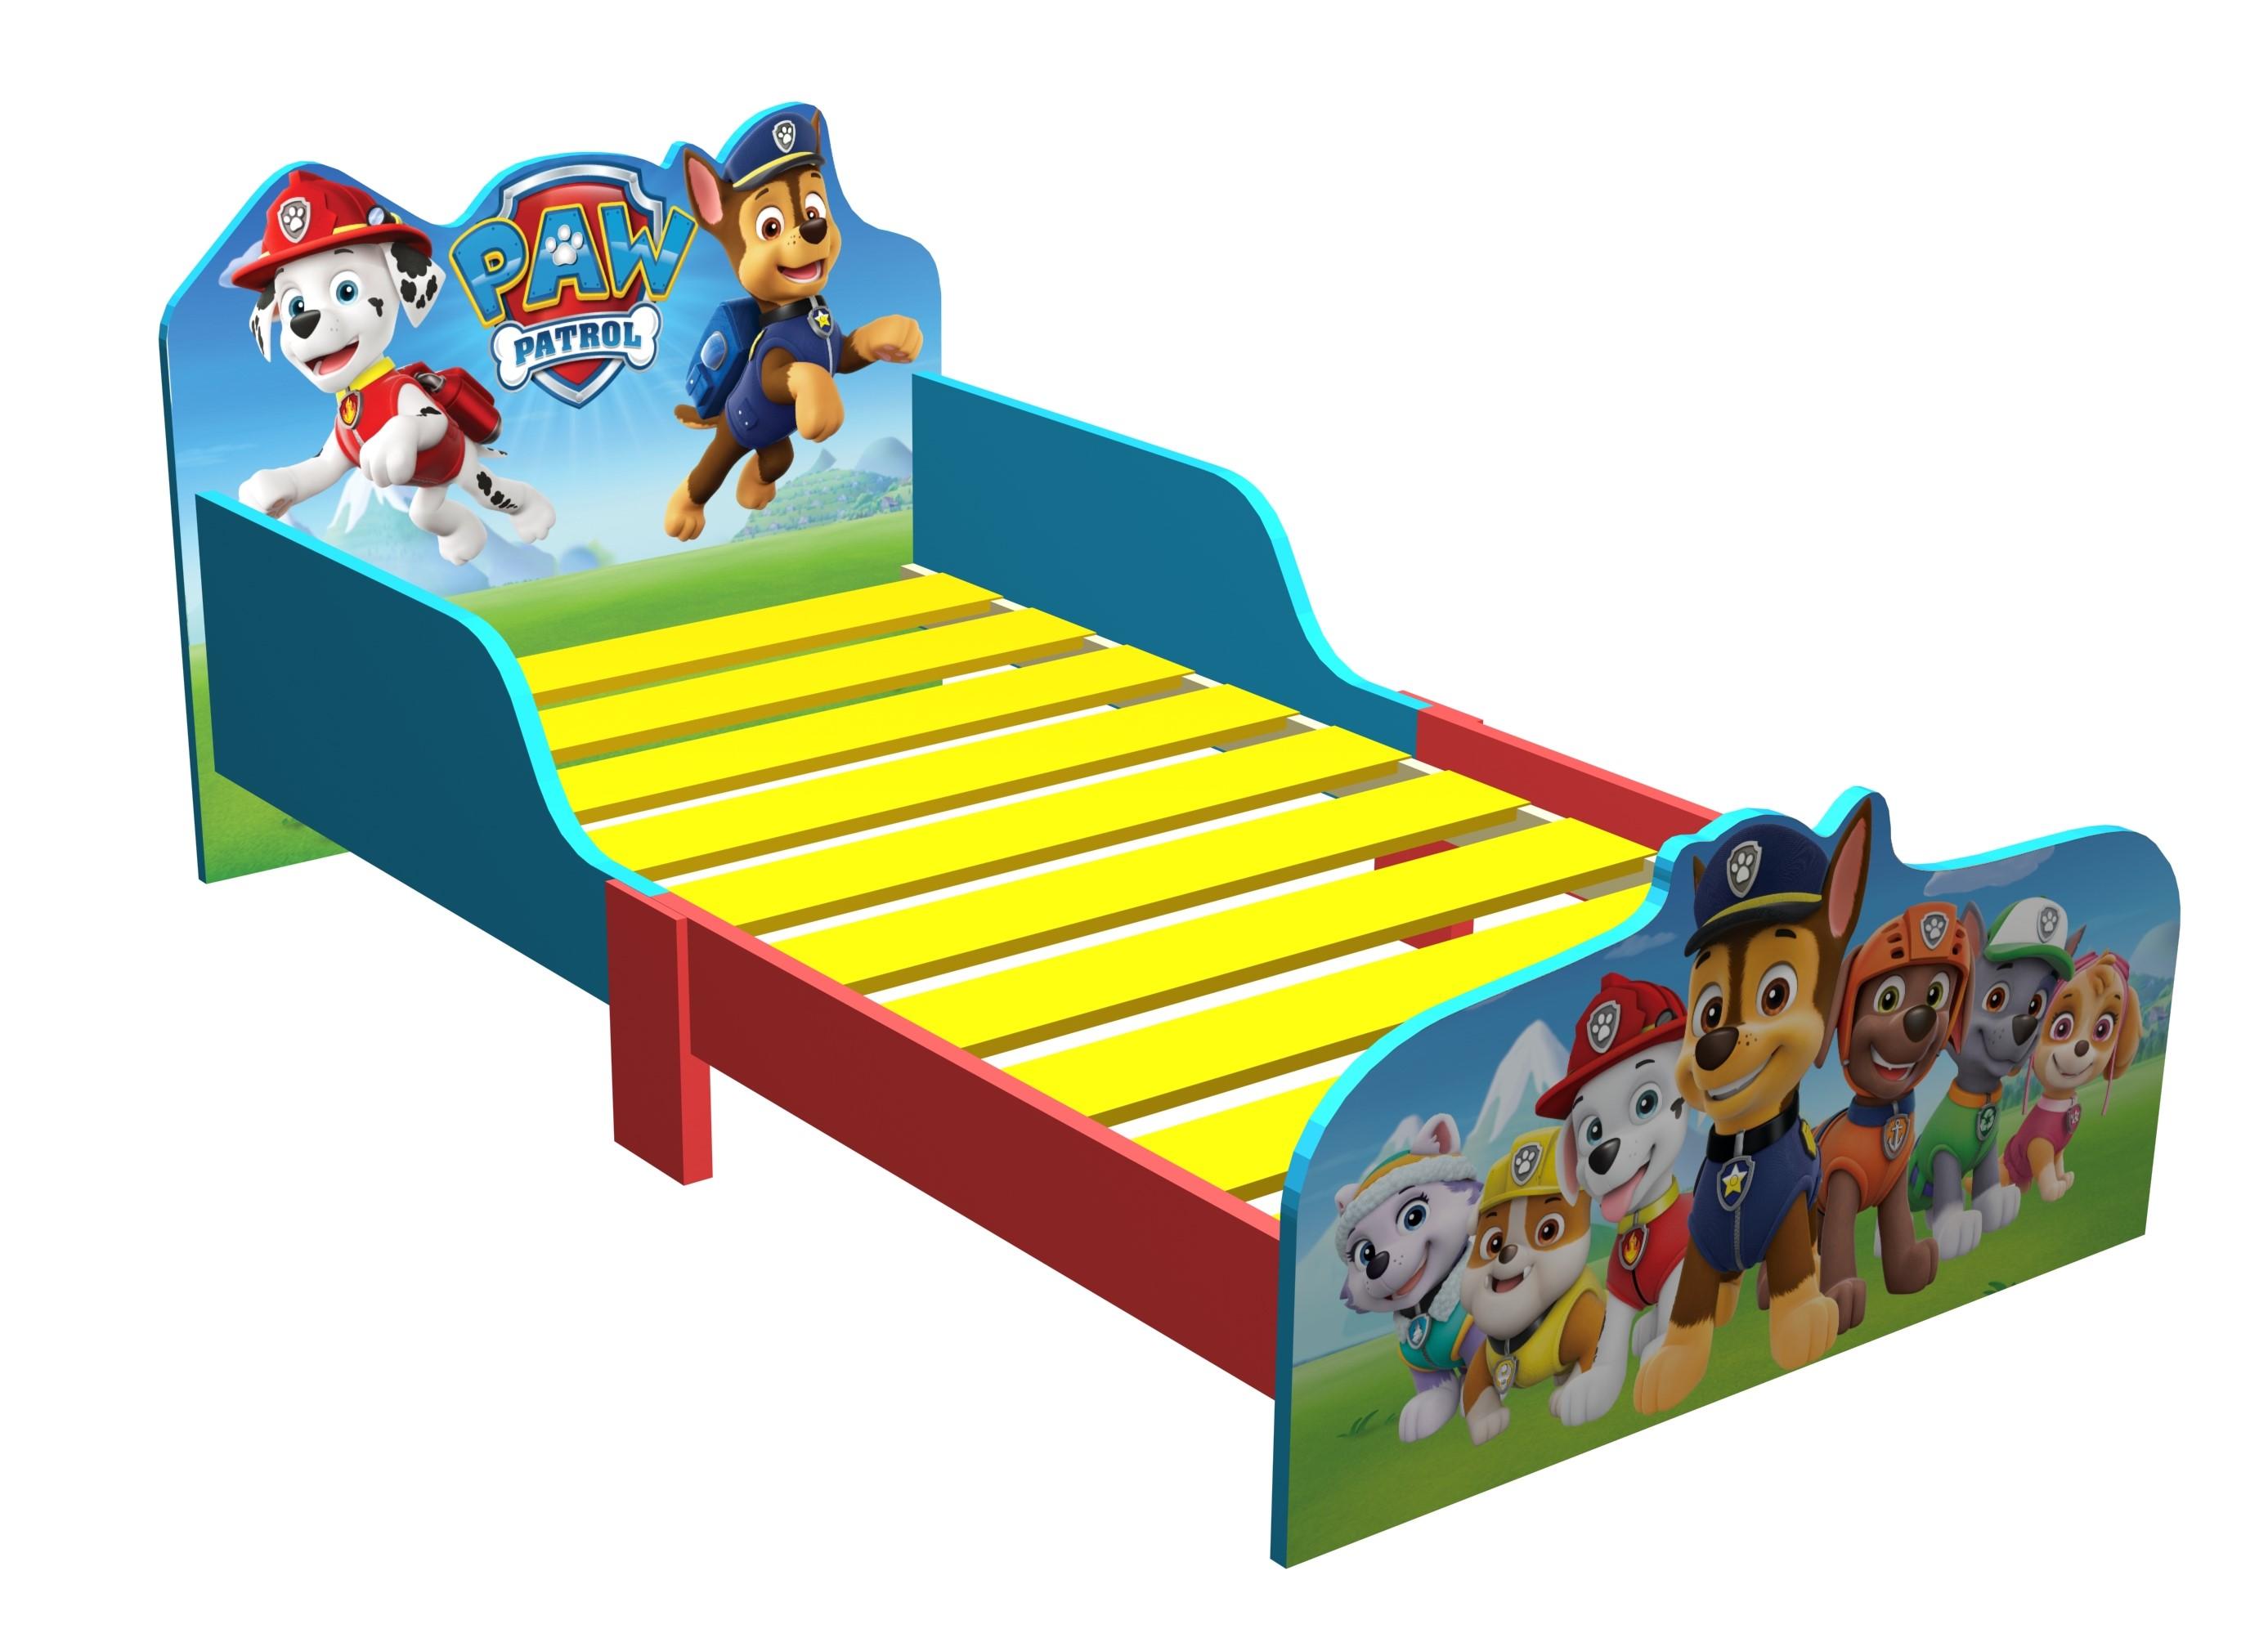 Paw Patrol Junior Bed!